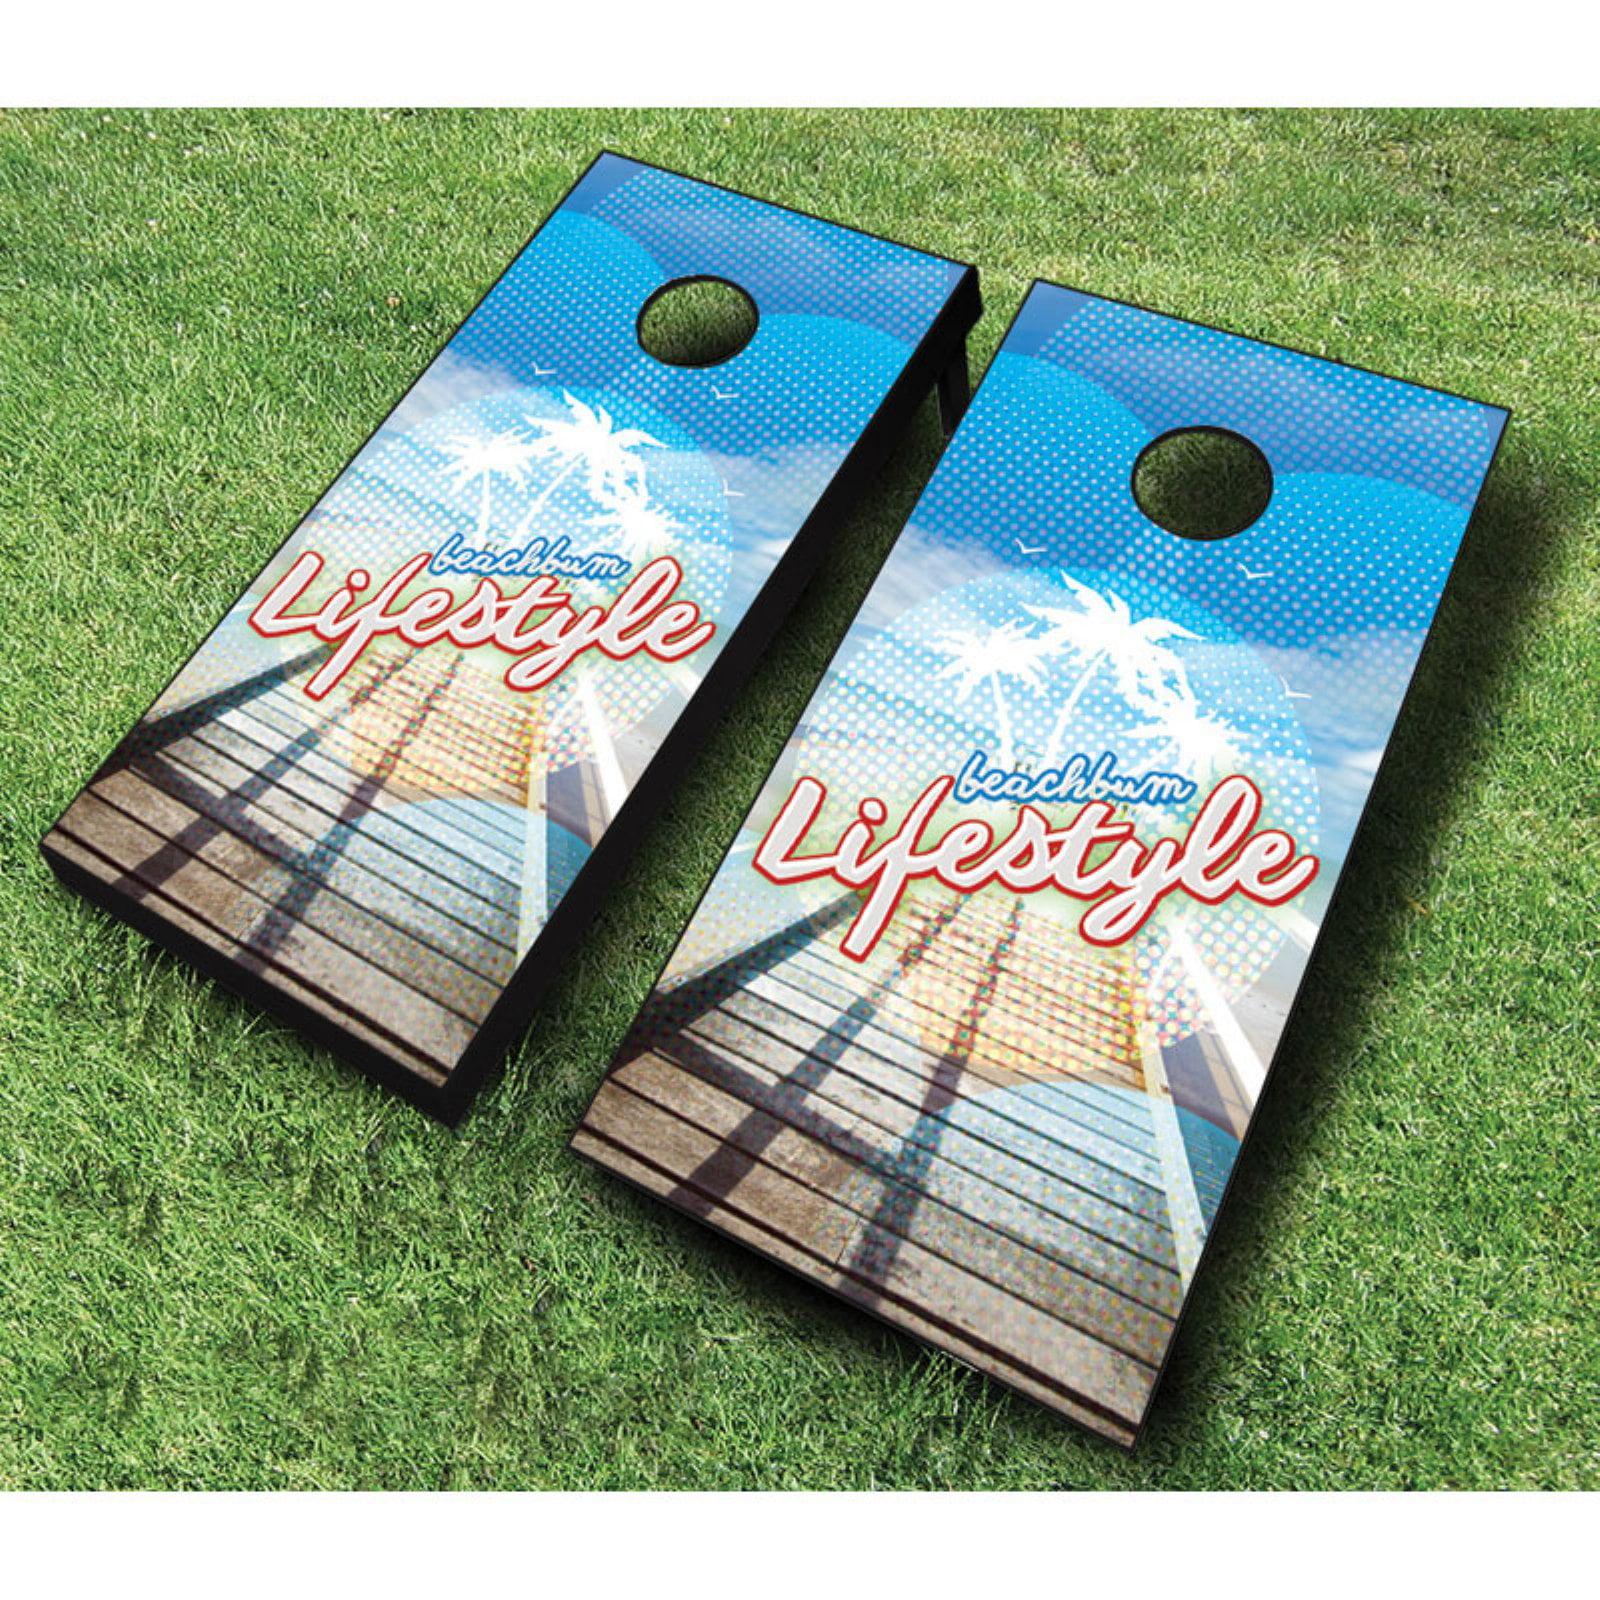 AJJ Cornhole Beach Bum Lifestyle Cornhole Set with Bags by